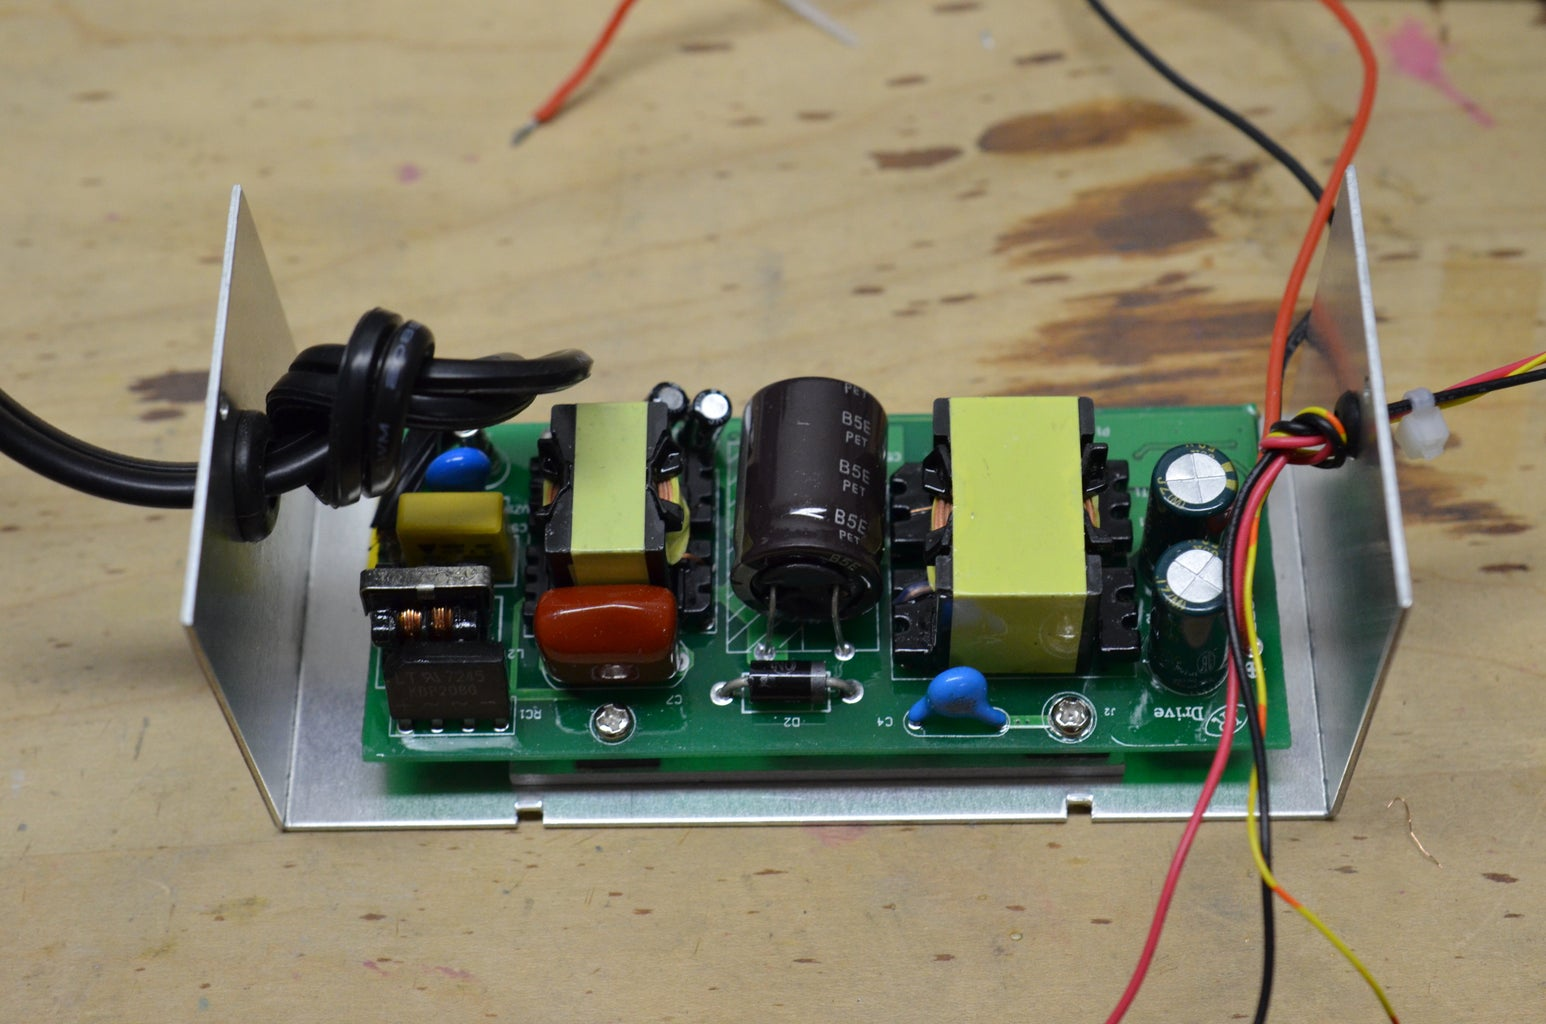 Assembling the Electronics Box